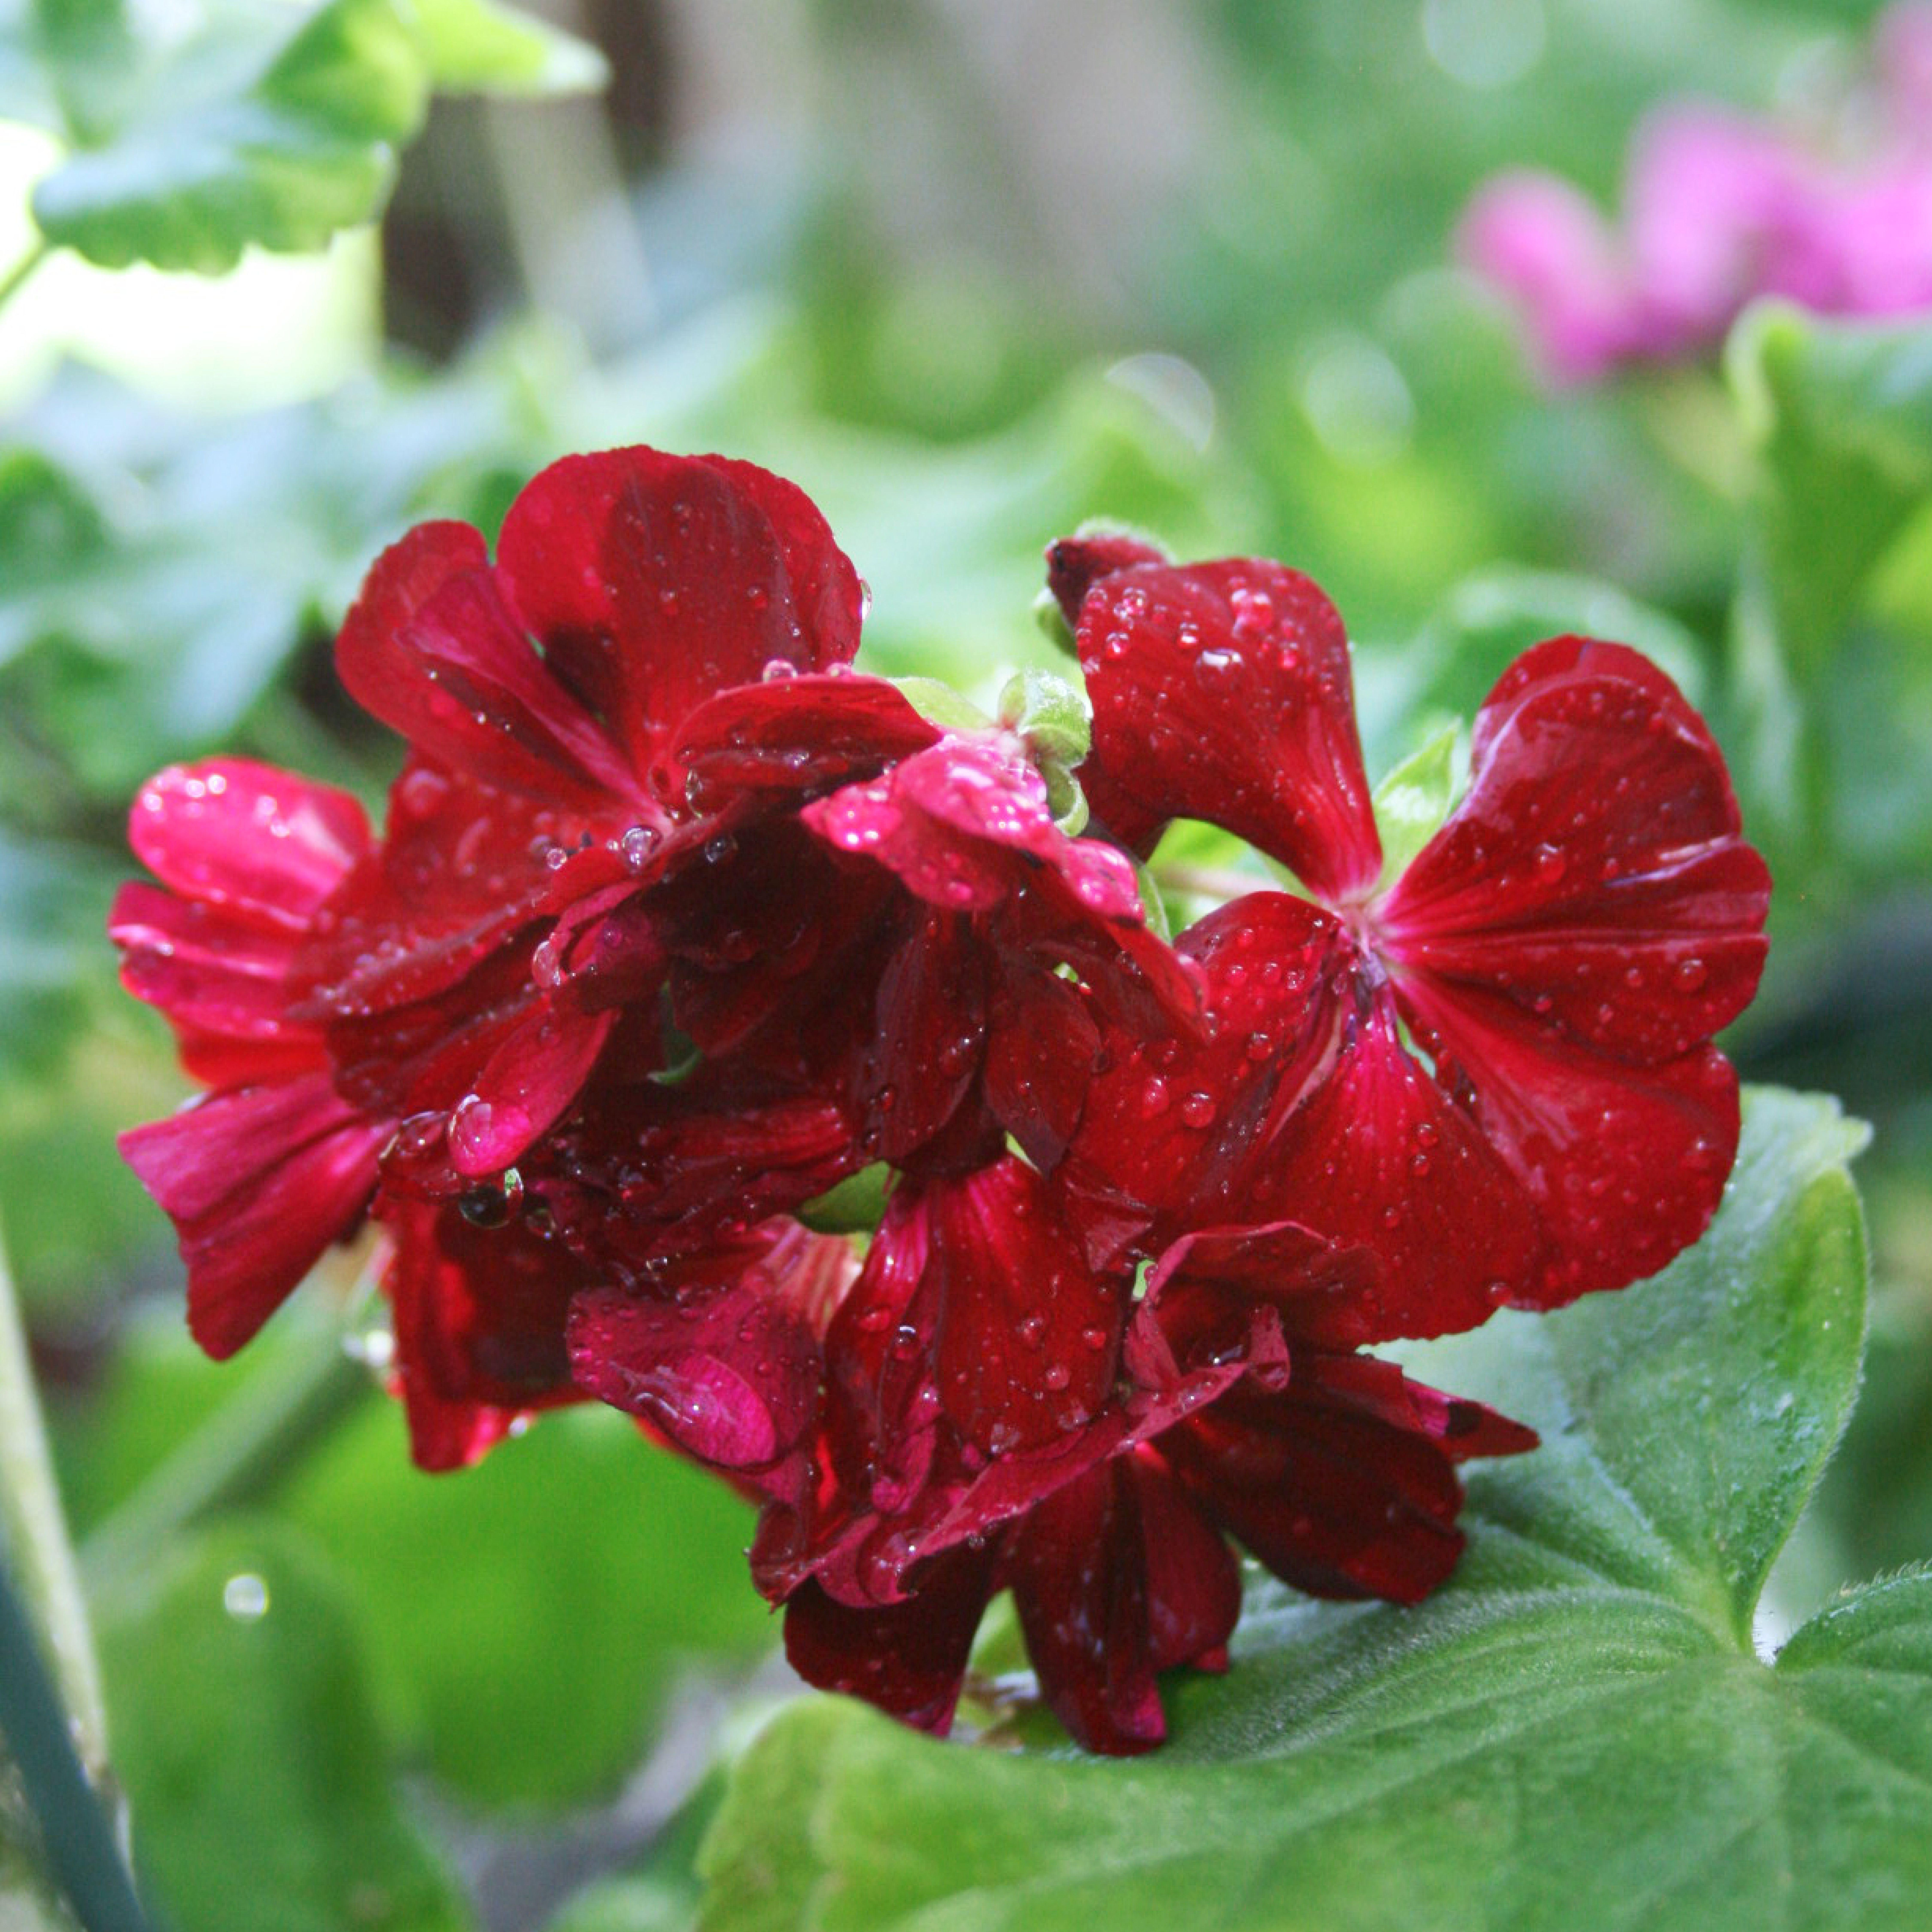 Freytags florist geranium blooms austin tx austin